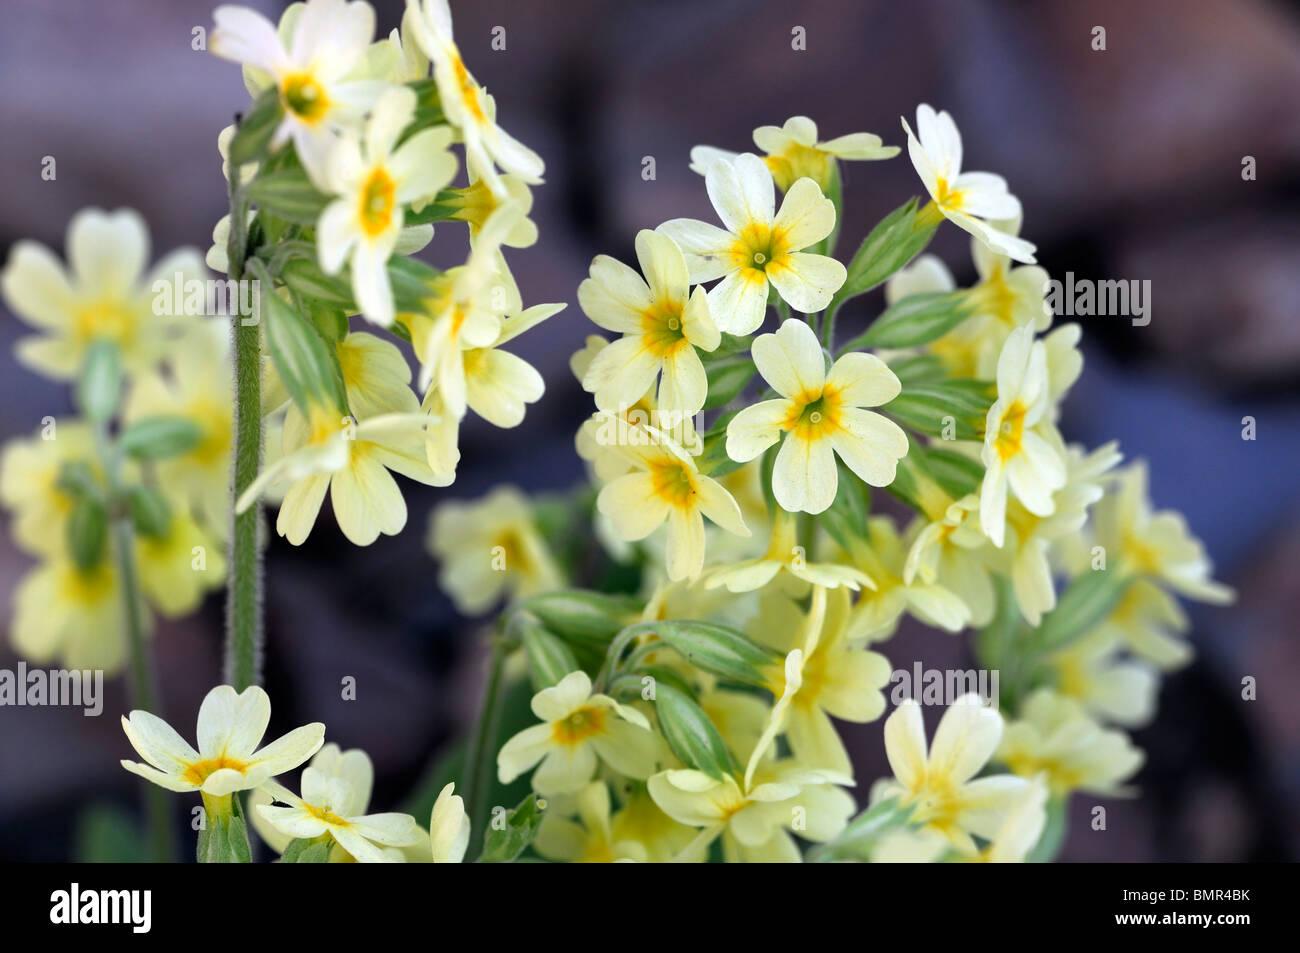 Primula elatior oxlip vero oxlip bassa crescita piante erbacee